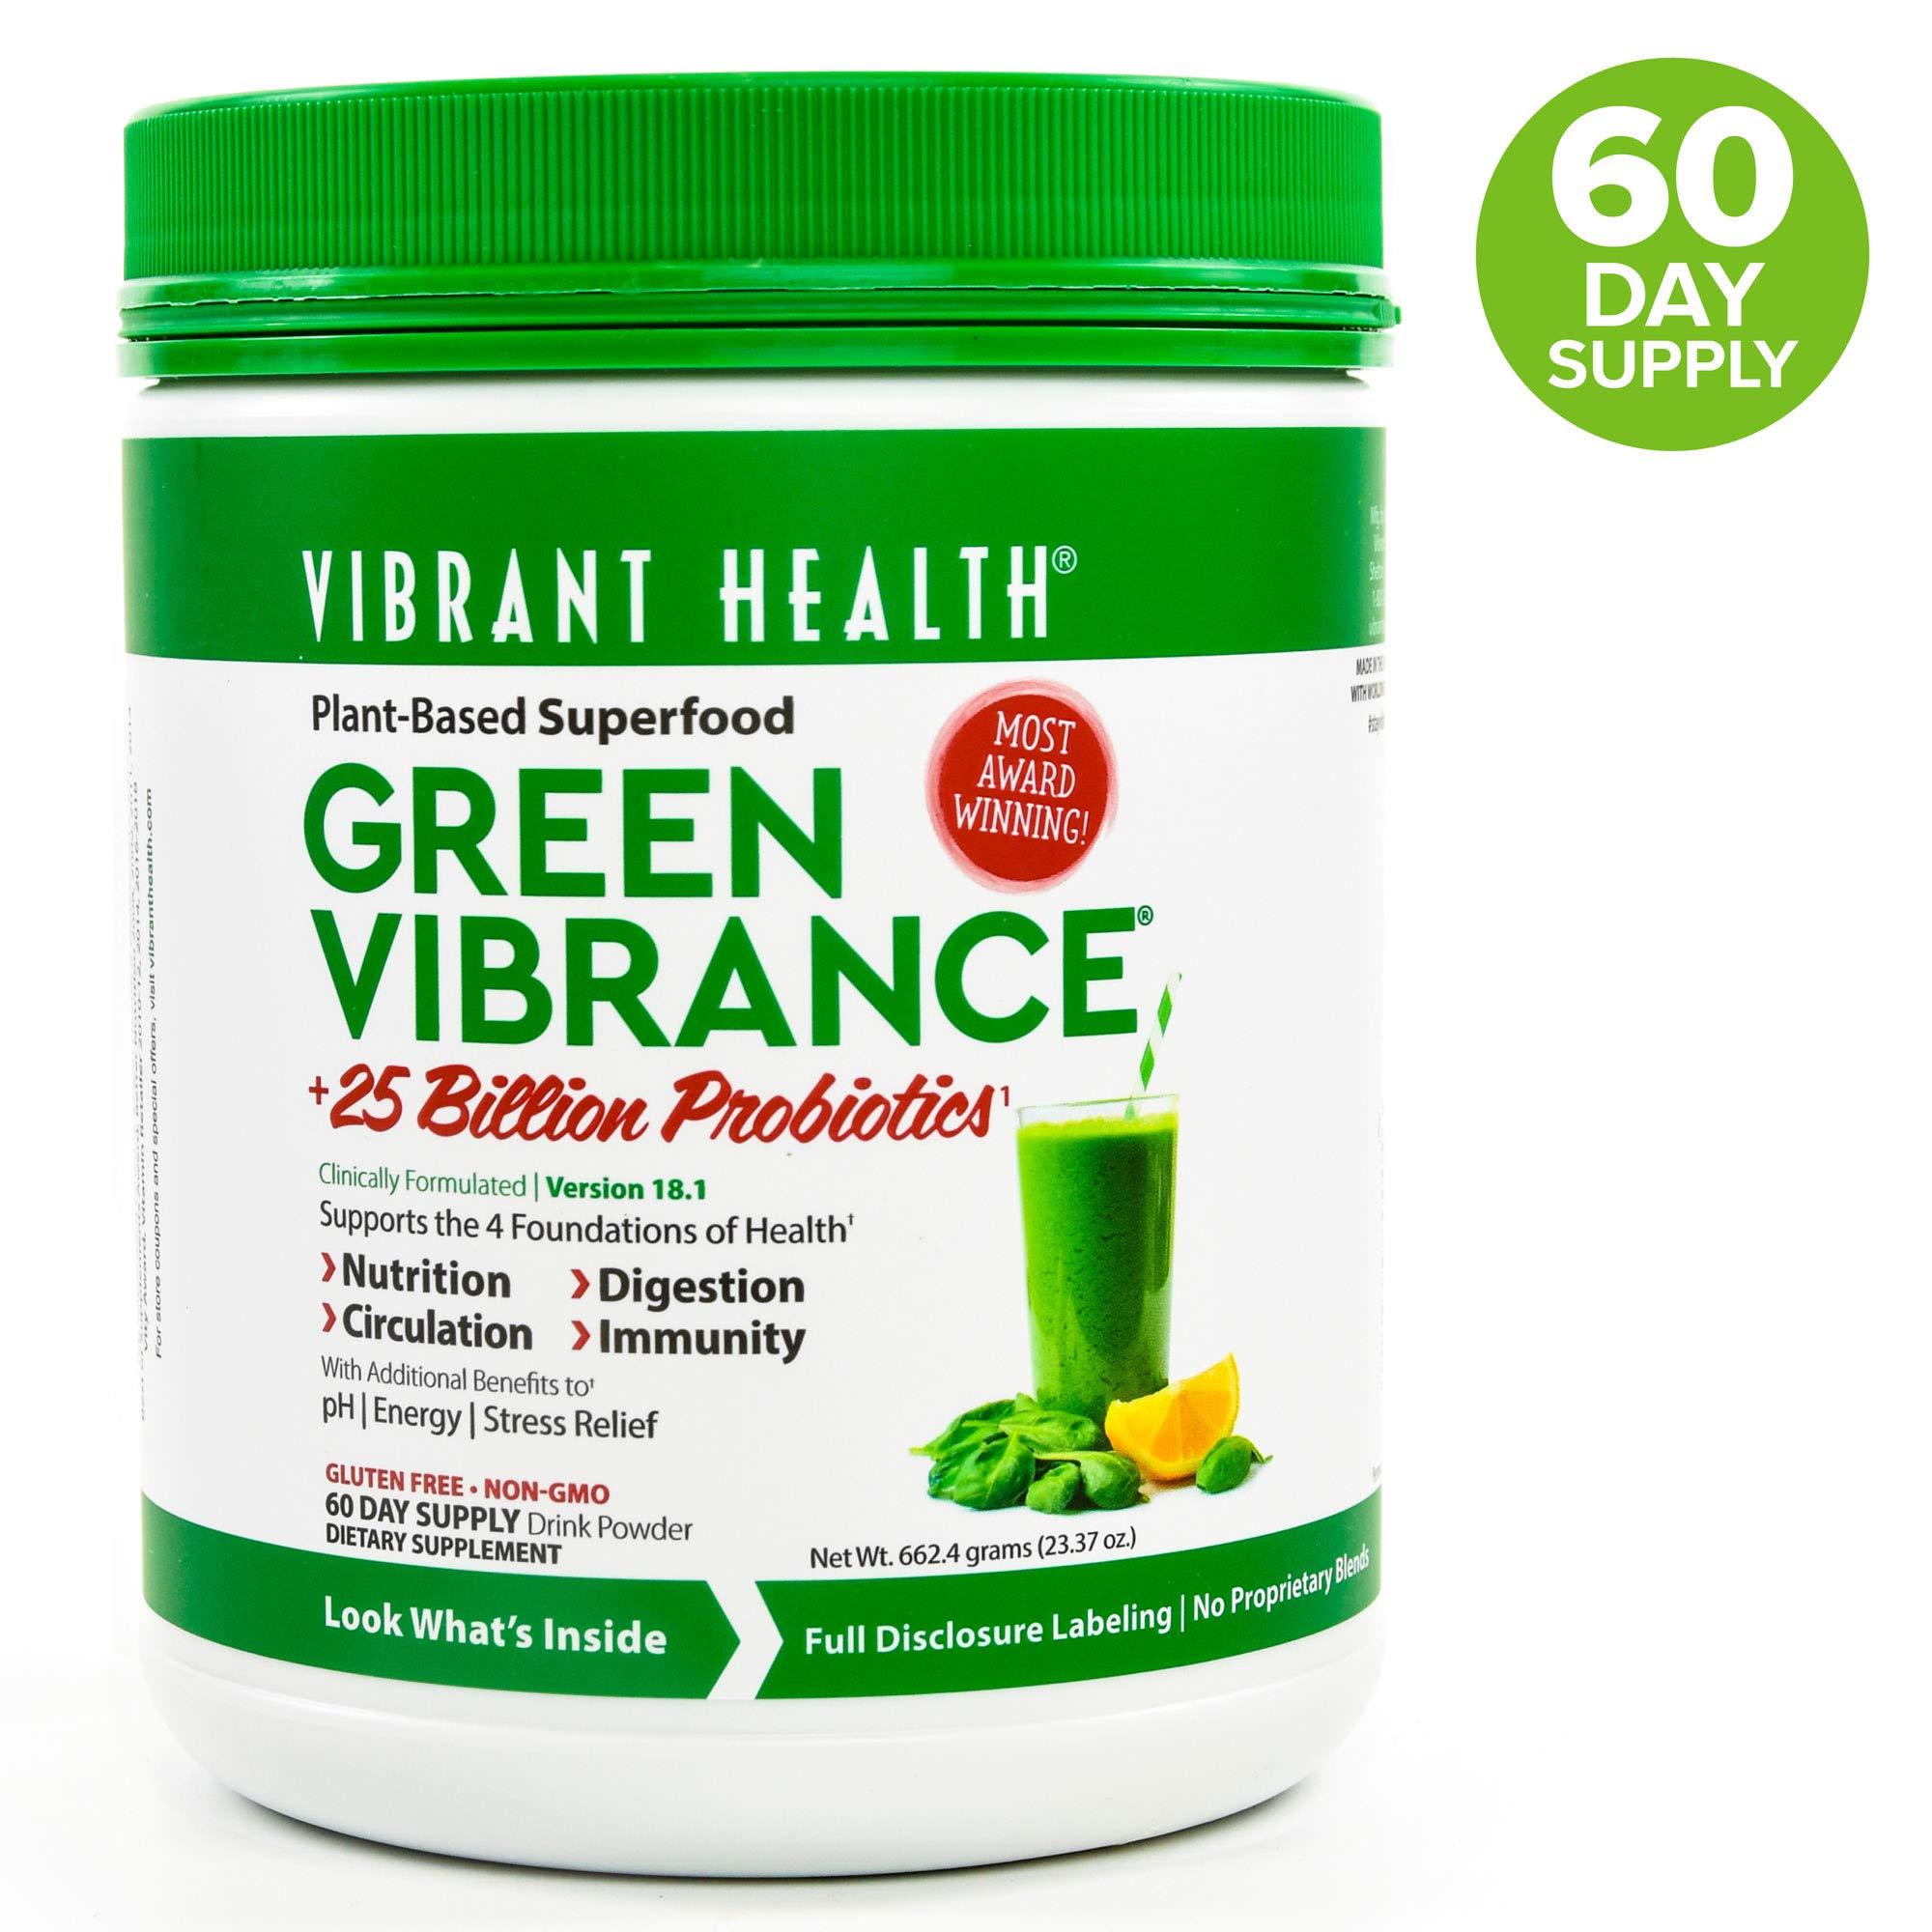 Vibrant Health, Green Vibrance, Plant-Based Superfood Powder, 25 Billion Probiotics Per Scoop, Vegetarian and Gluten Free, 60 Servings (FFP) by Vibrant Health